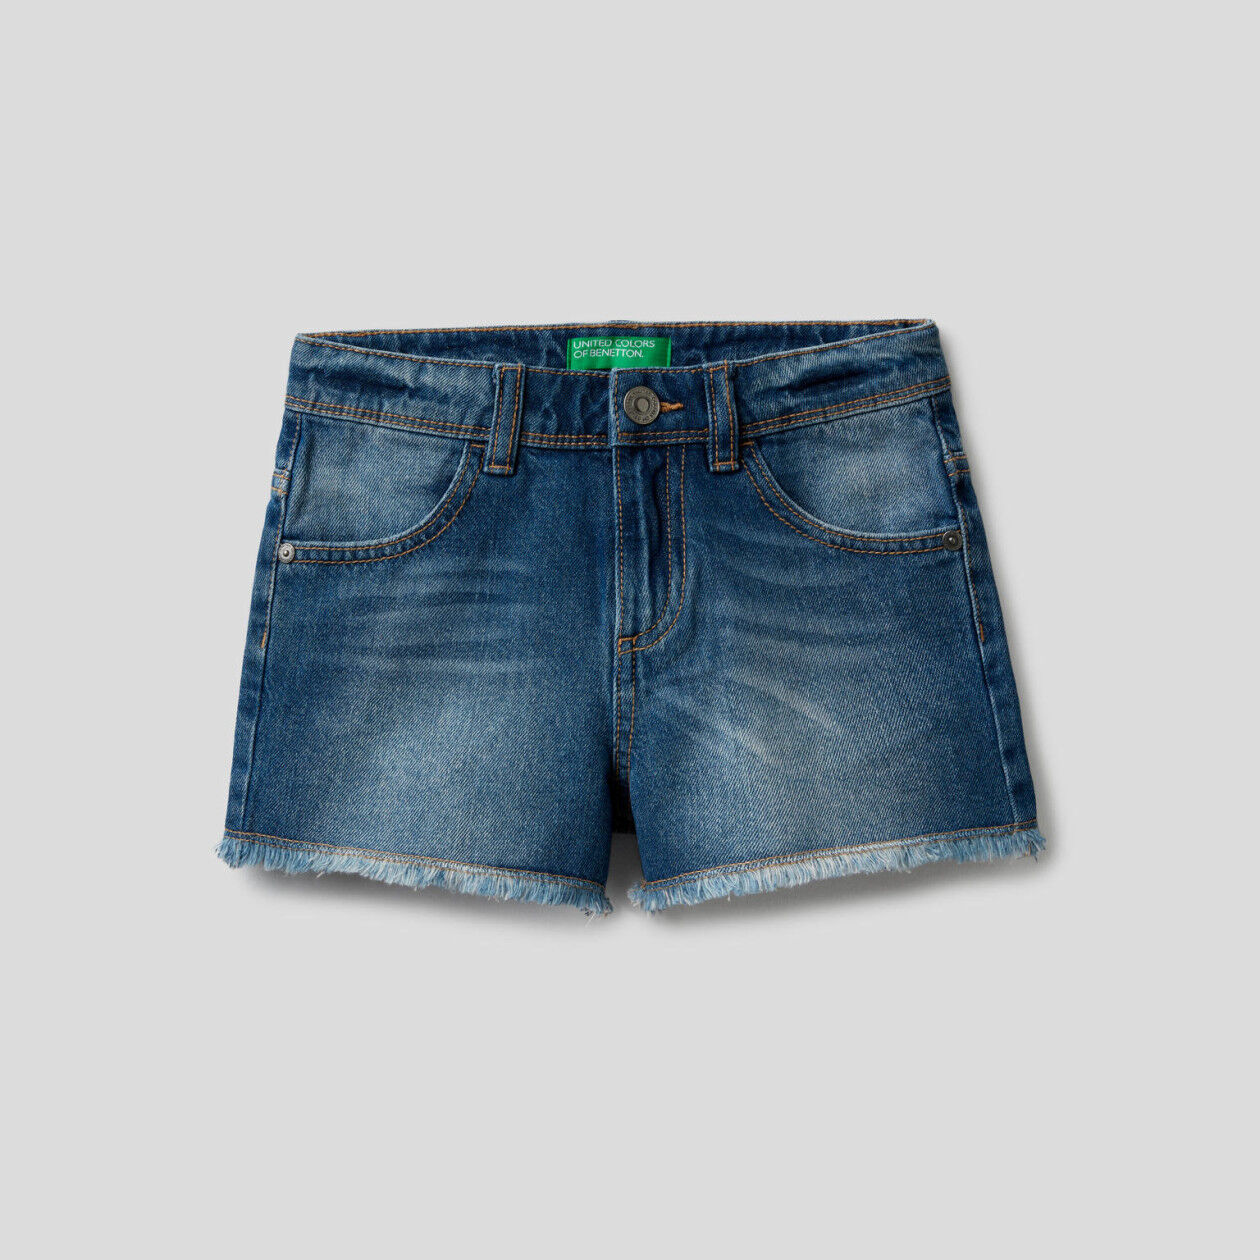 Pantalón corto en denim de 100% algodón